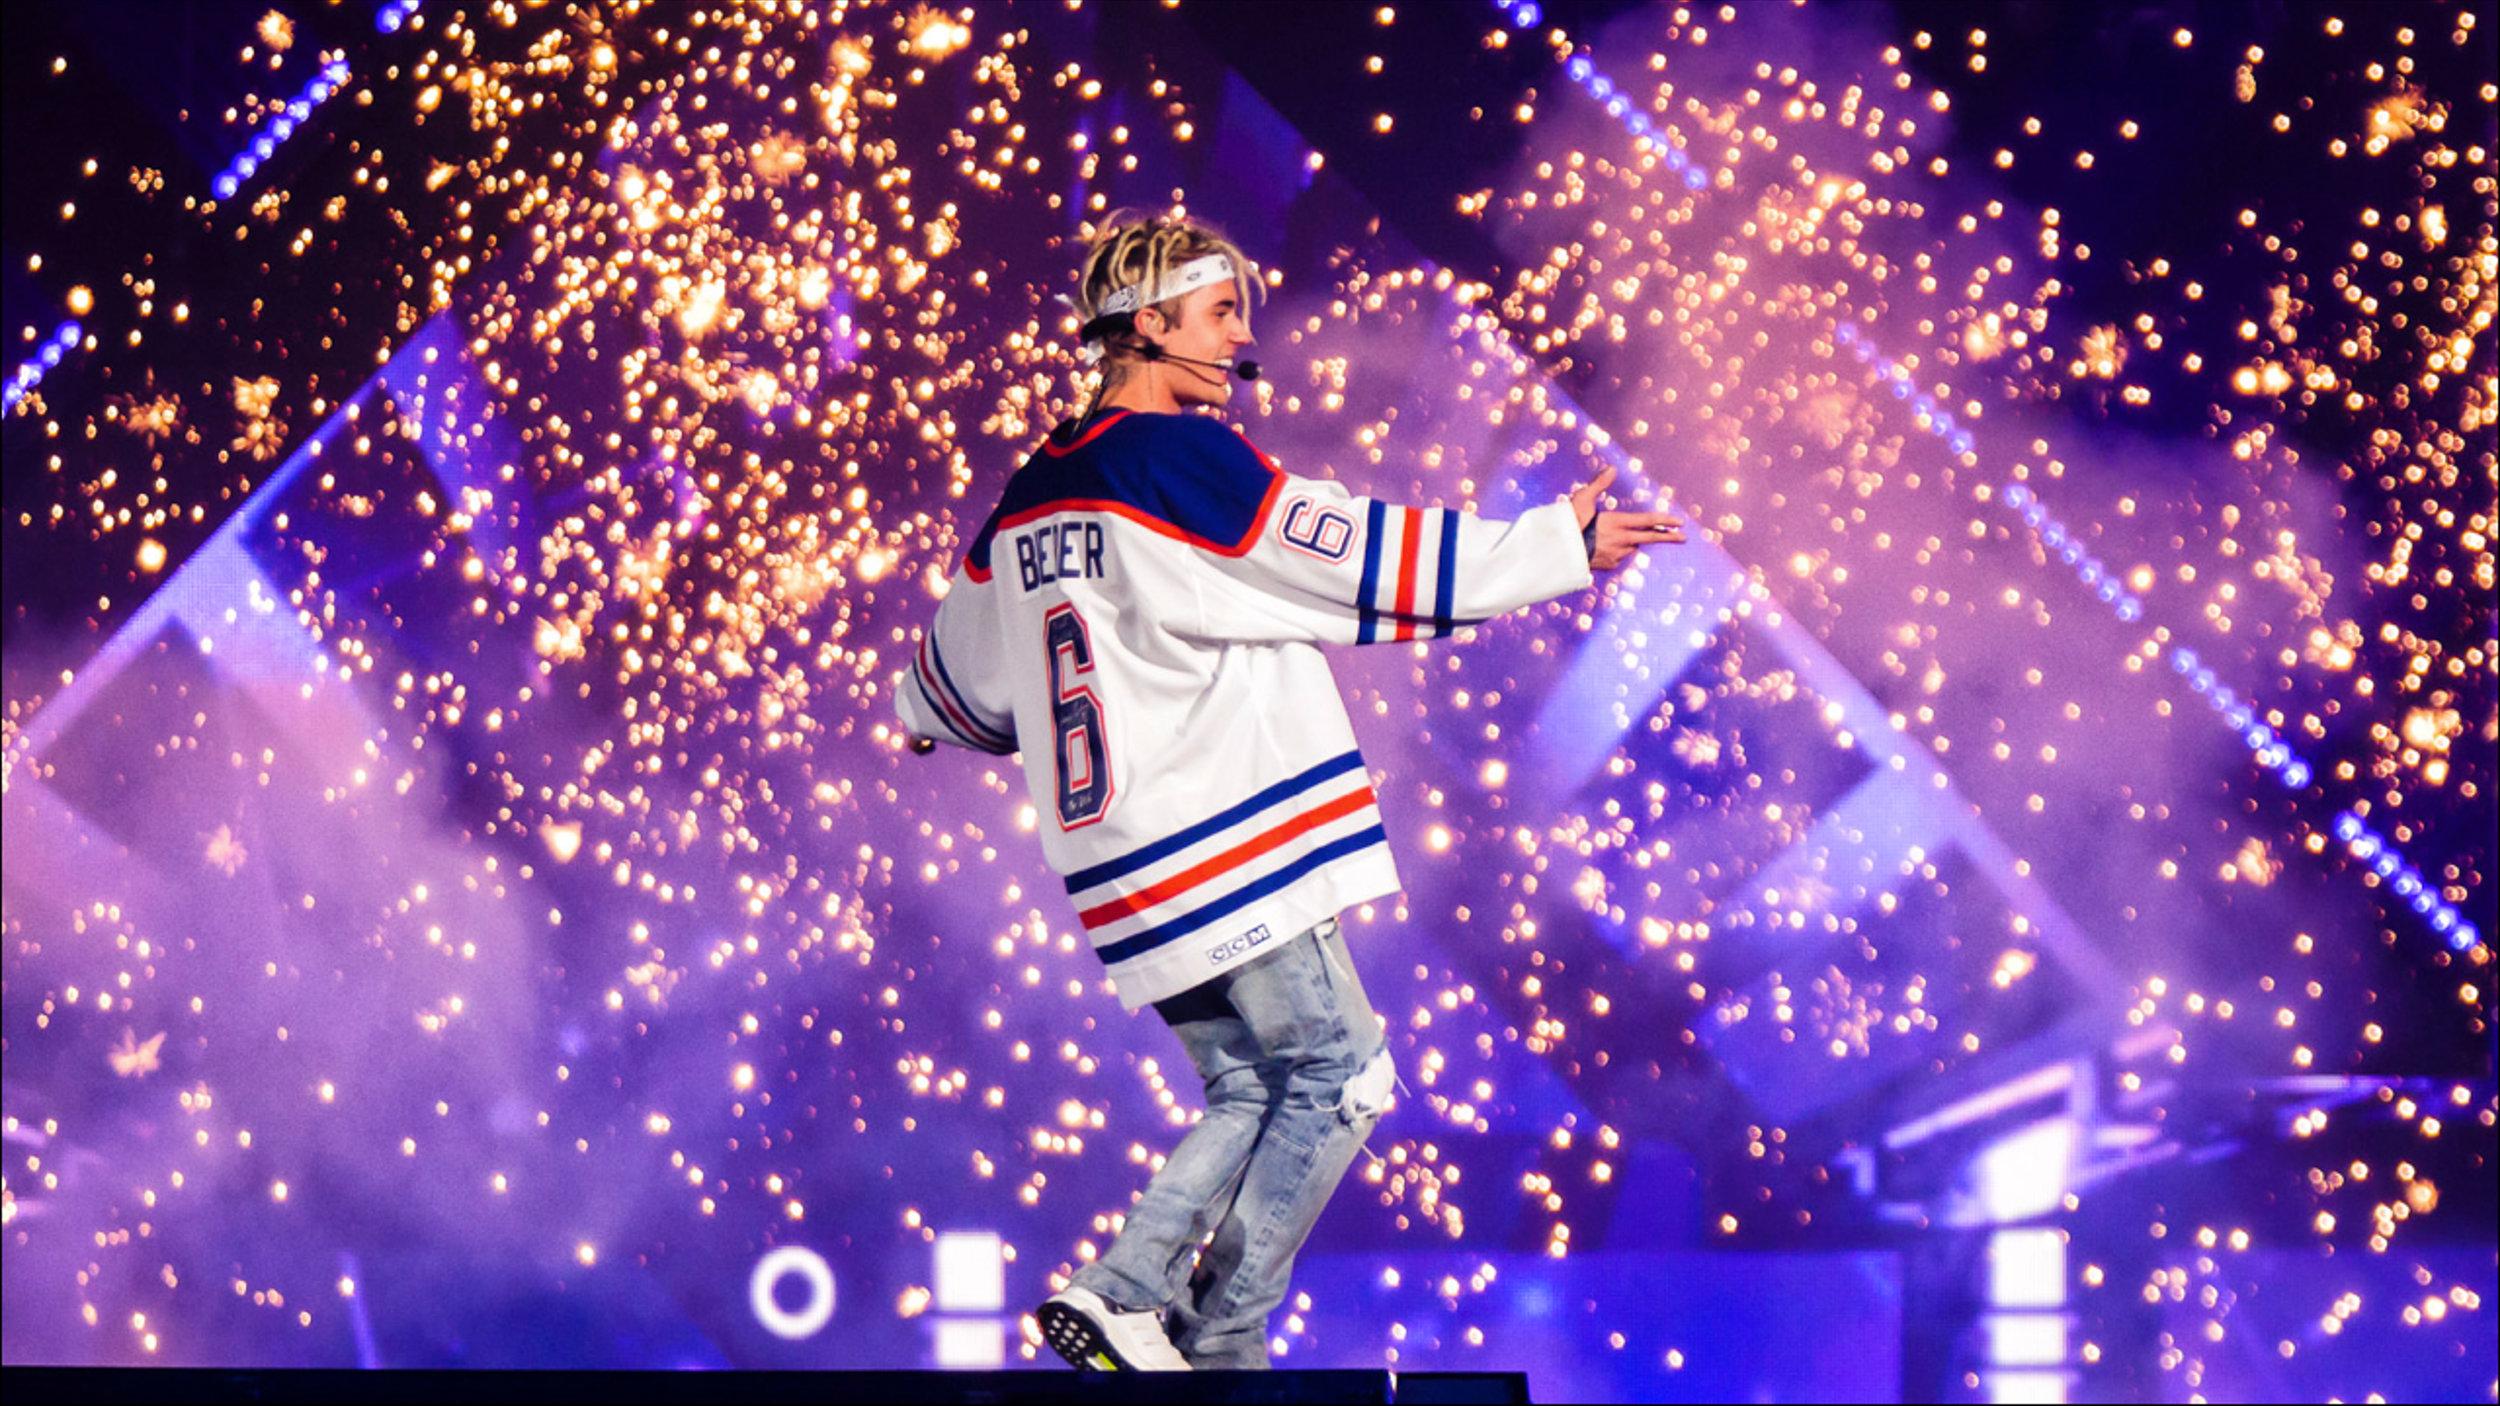 Justin Bieber//Denver, Colorado